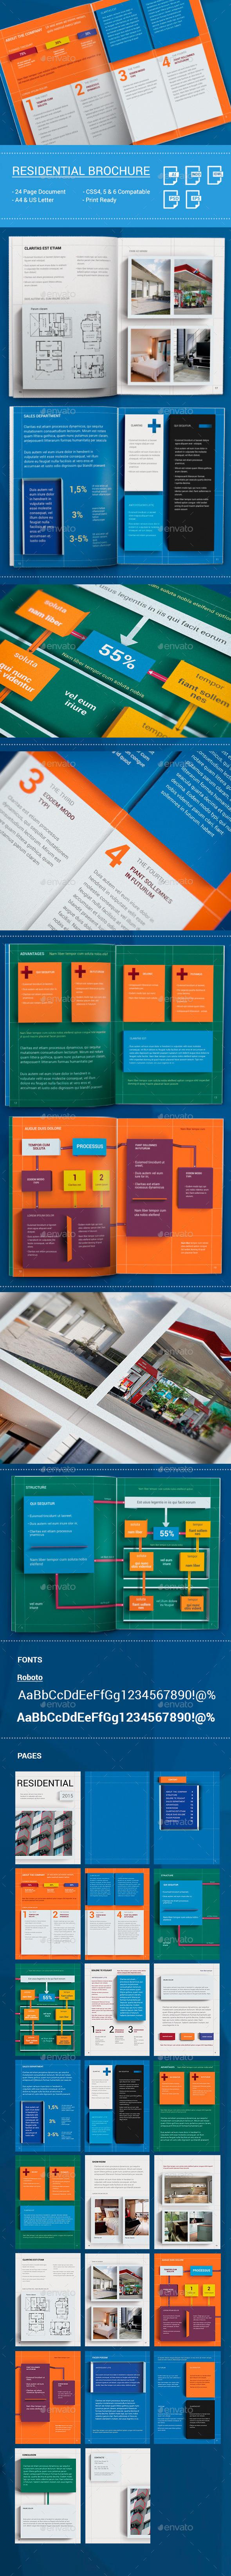 DIEZ 3D Elements Brochure Template - Brochures Print Templates